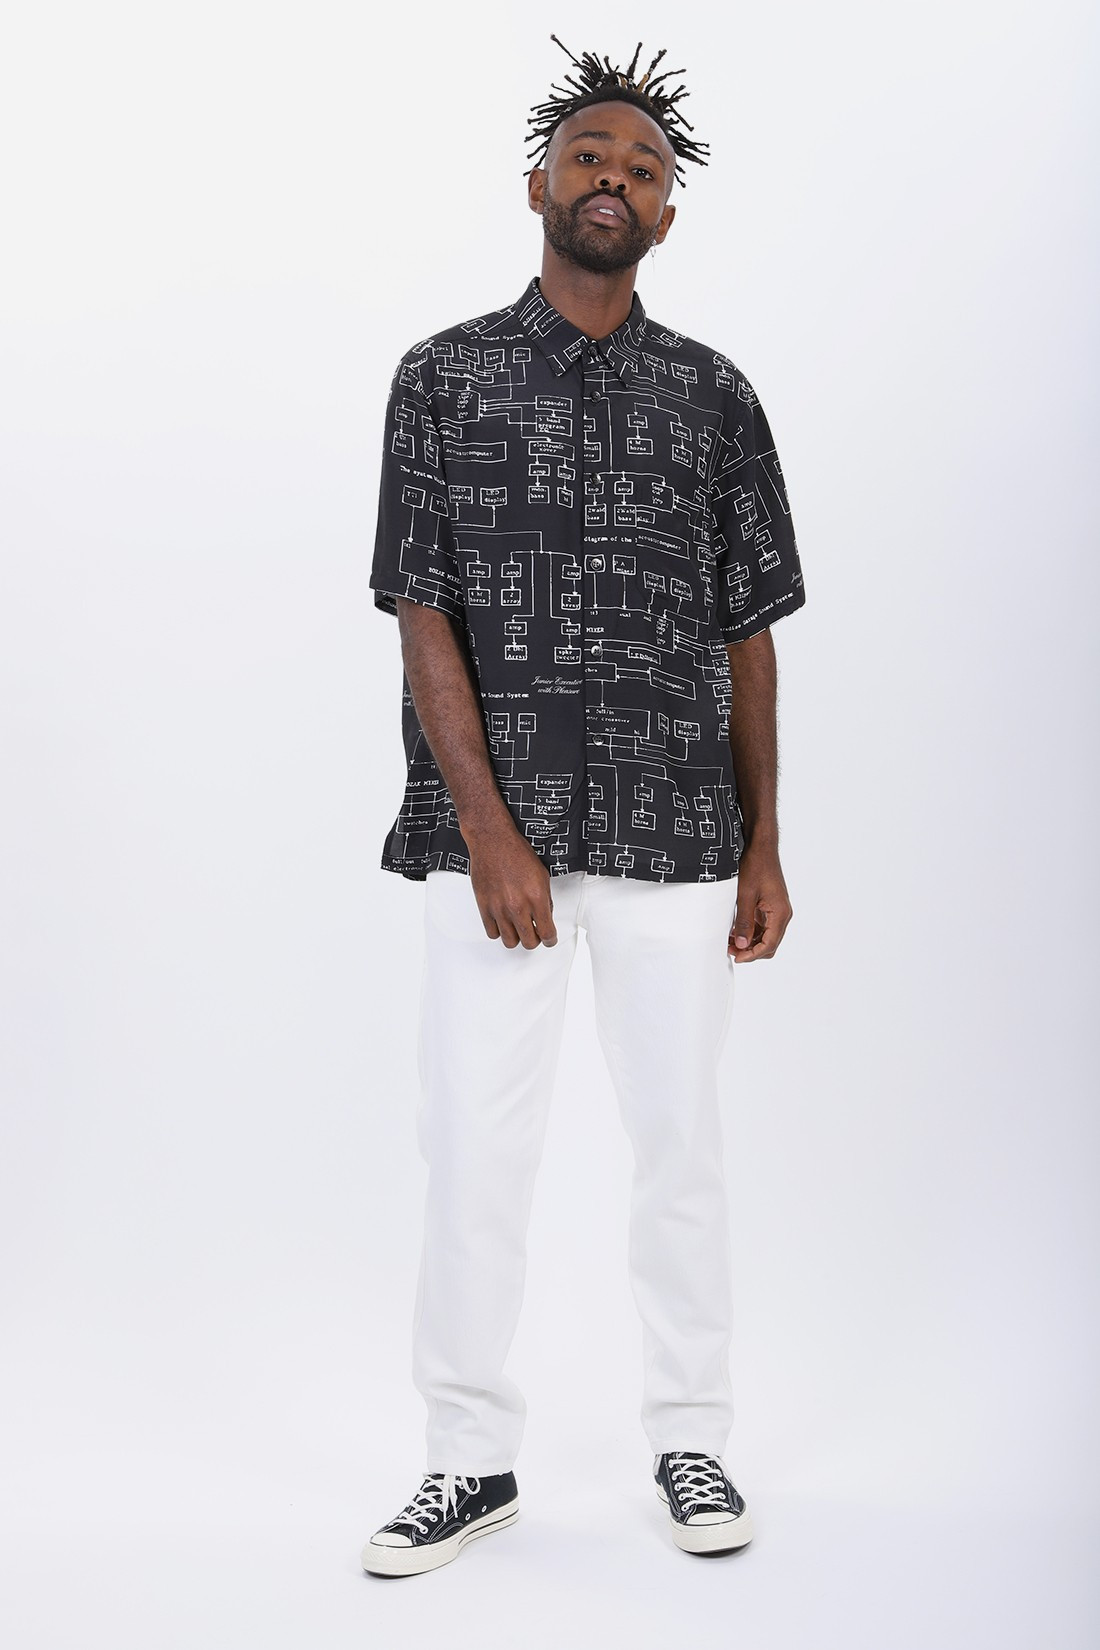 PLEASURE / Sound system shirt Black